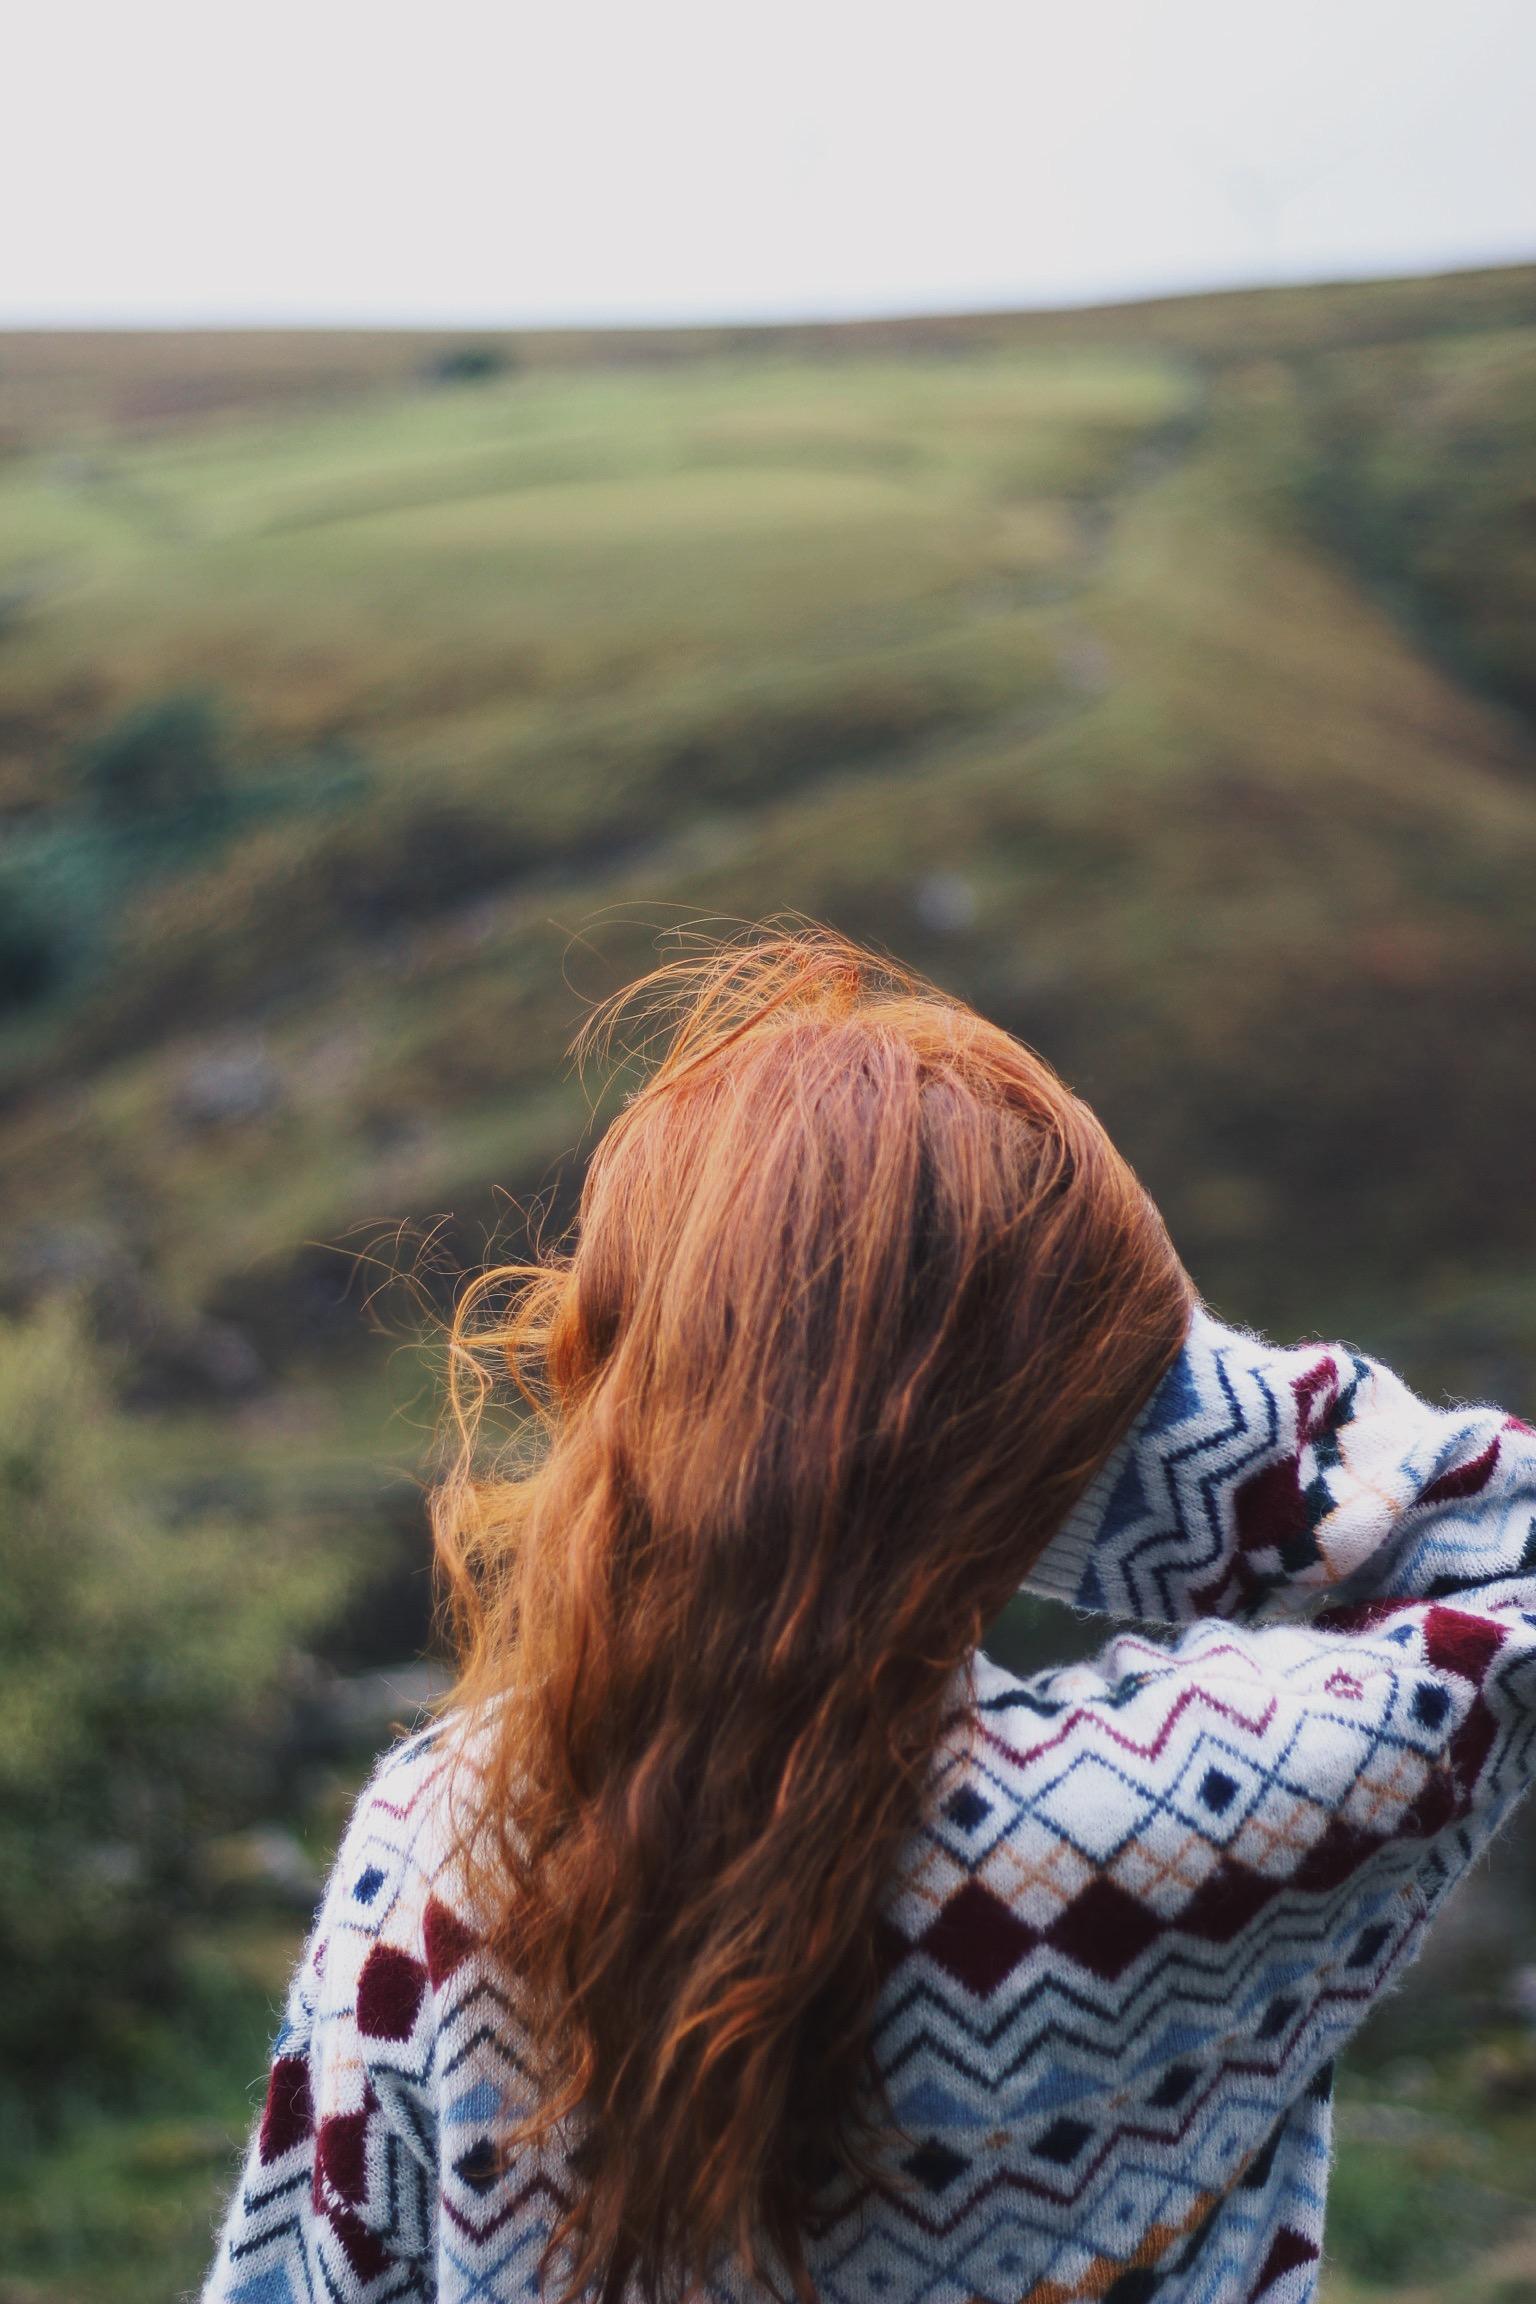 Girl, red hair, countryside